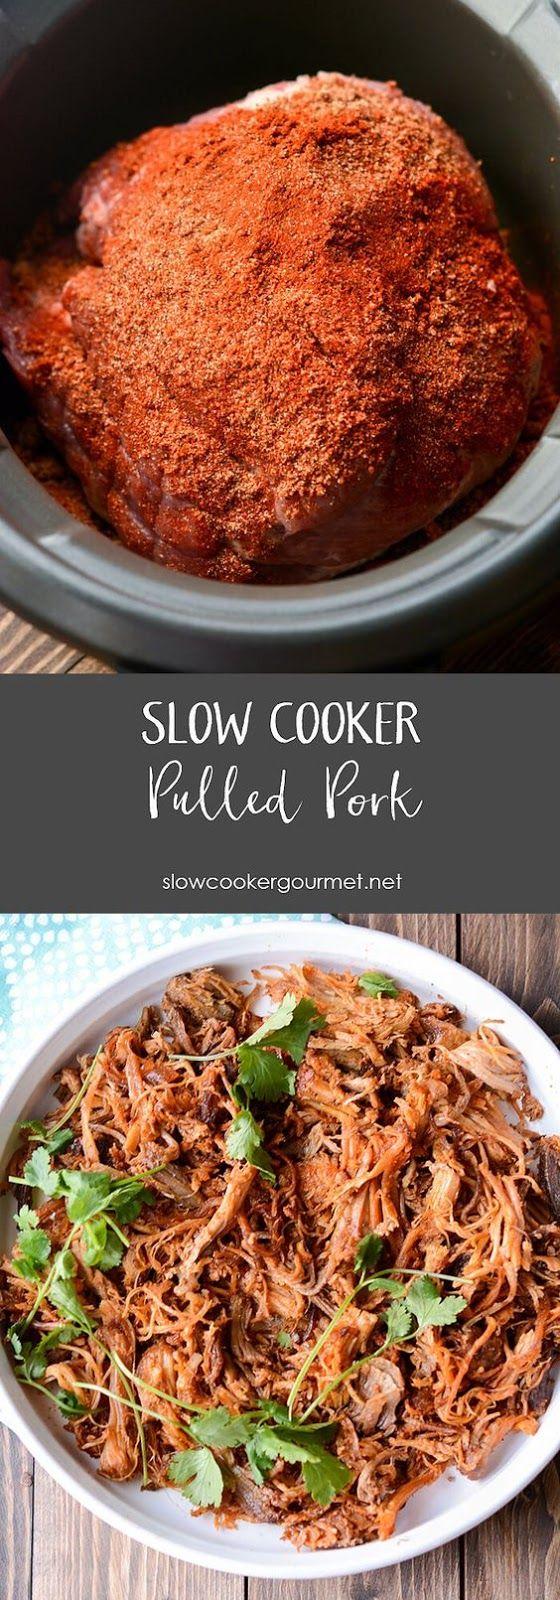 The Best Slow Cooker Pulled Pork #slowcookerrecipes #pulledpork